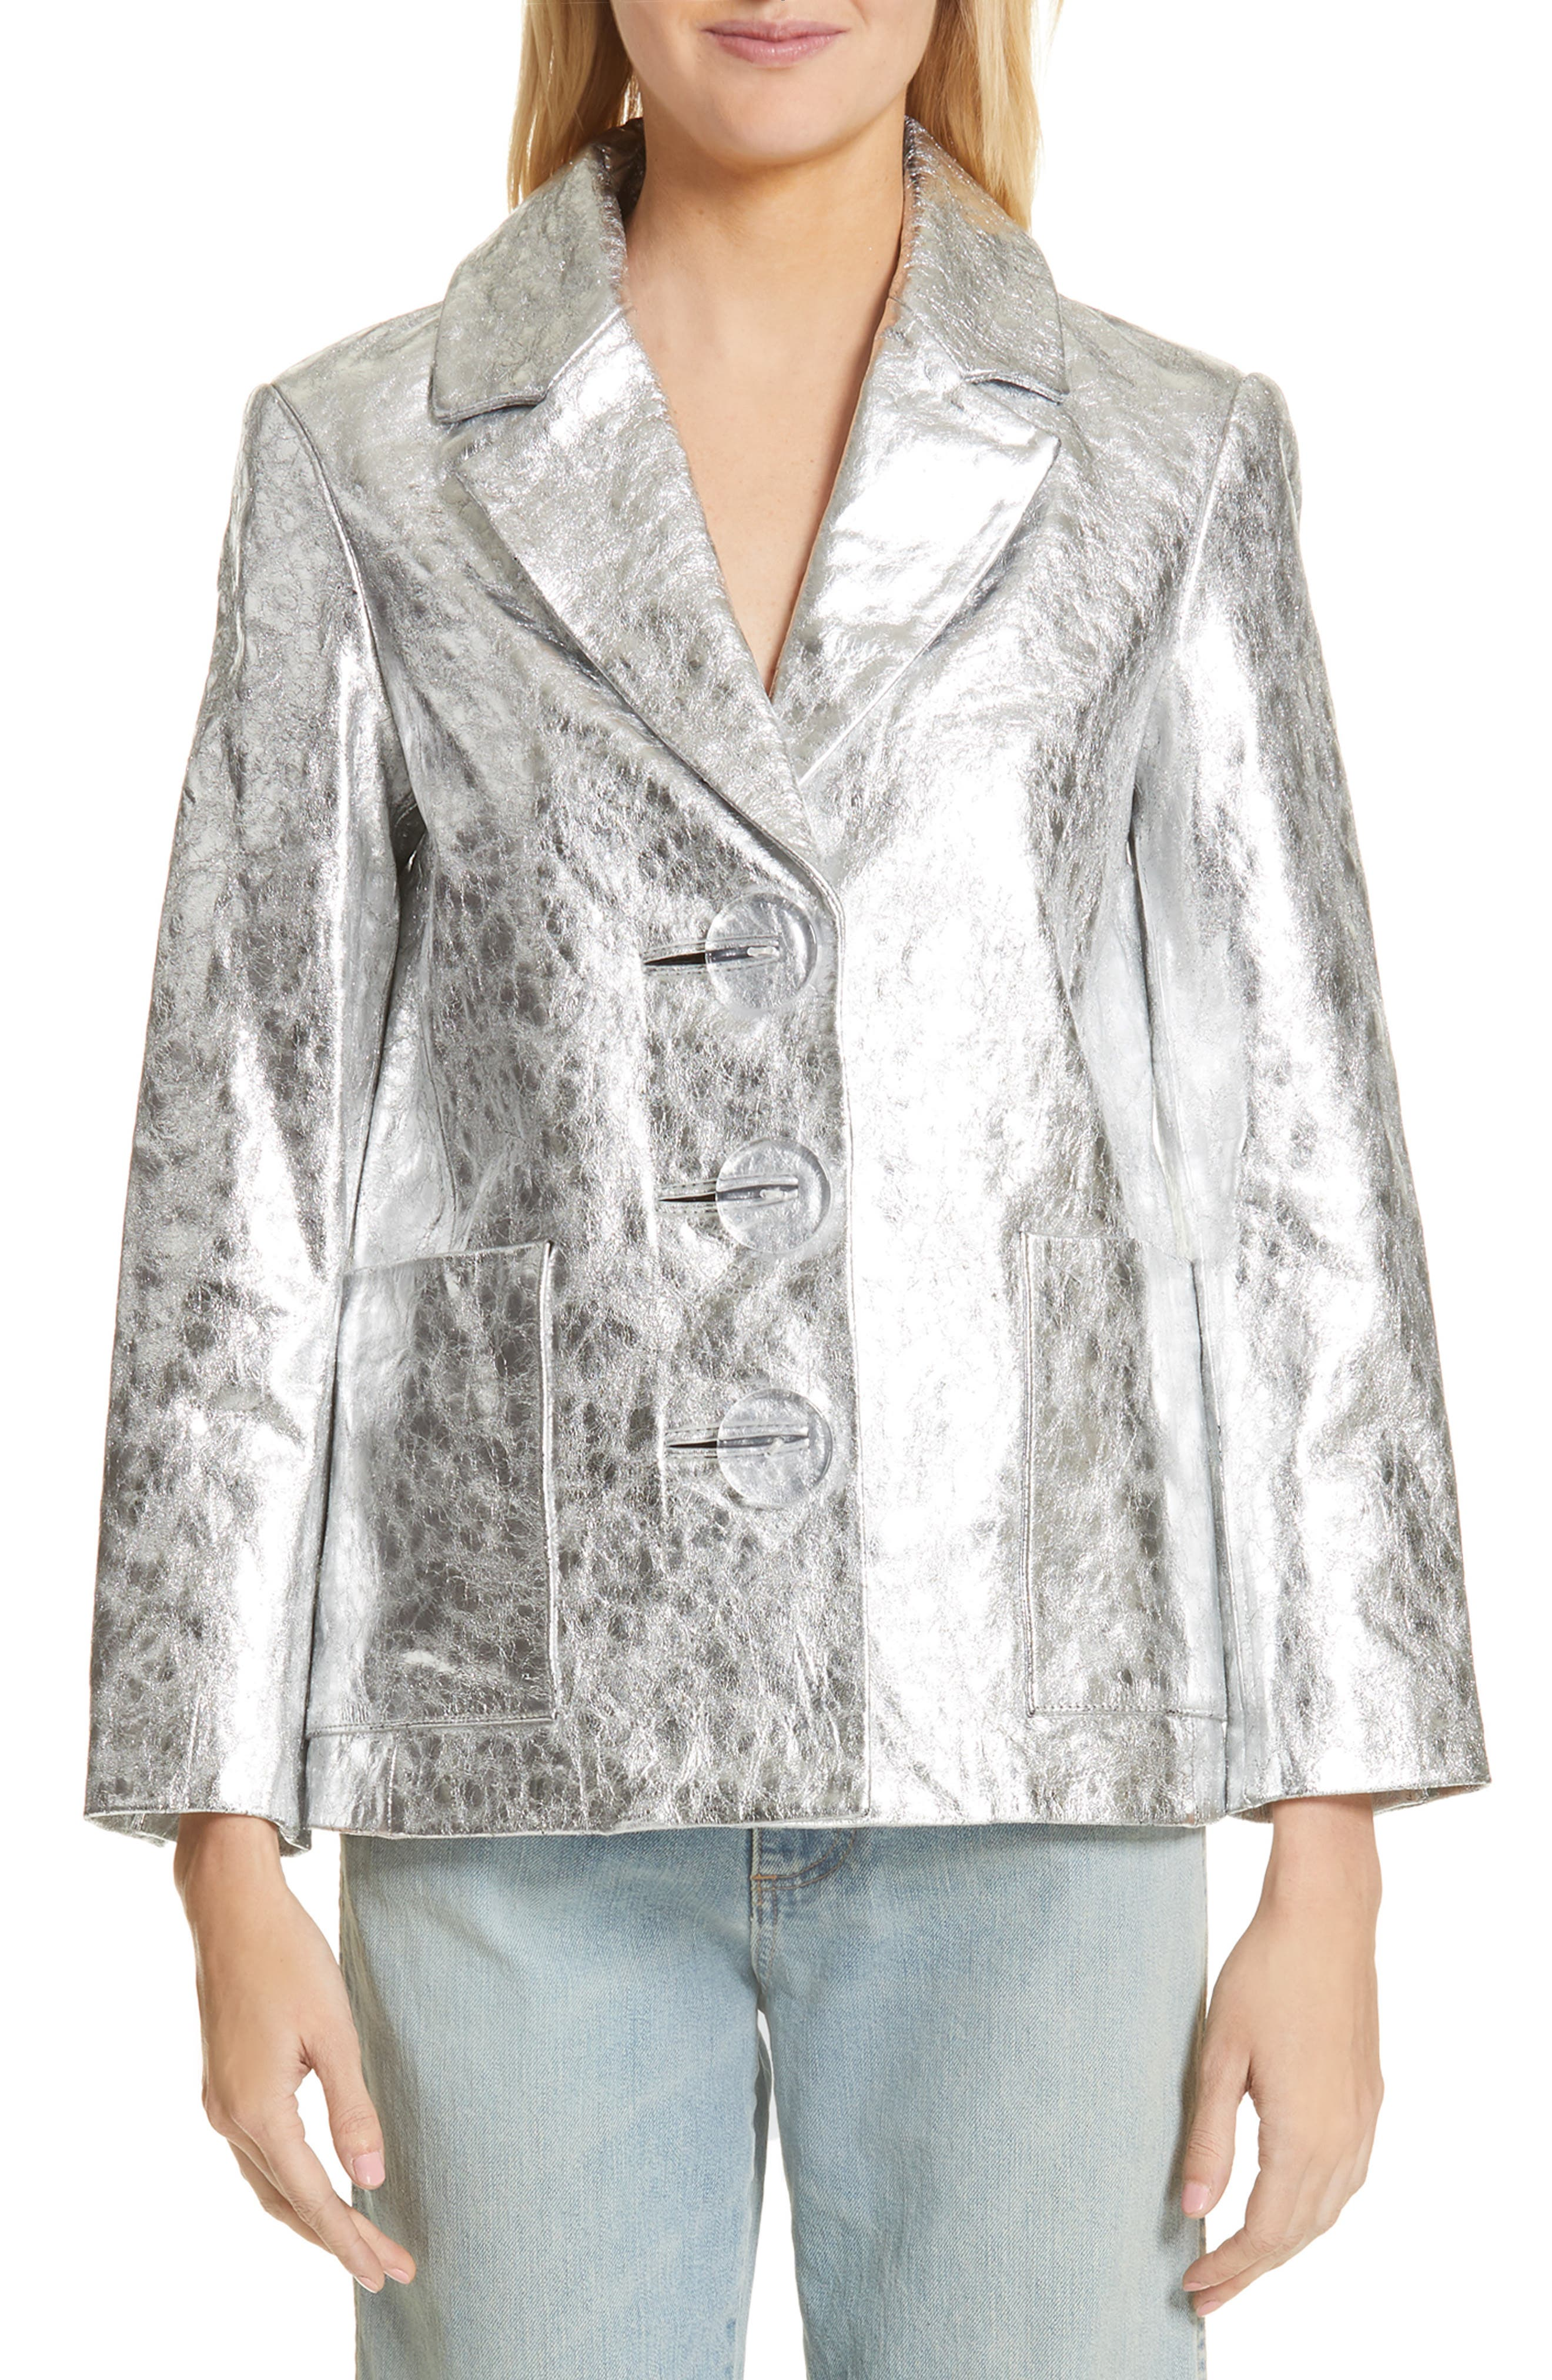 SIMON MILLER,                             Dawes Crackled Leather Jacket,                             Main thumbnail 1, color,                             SILVER CRACKLE